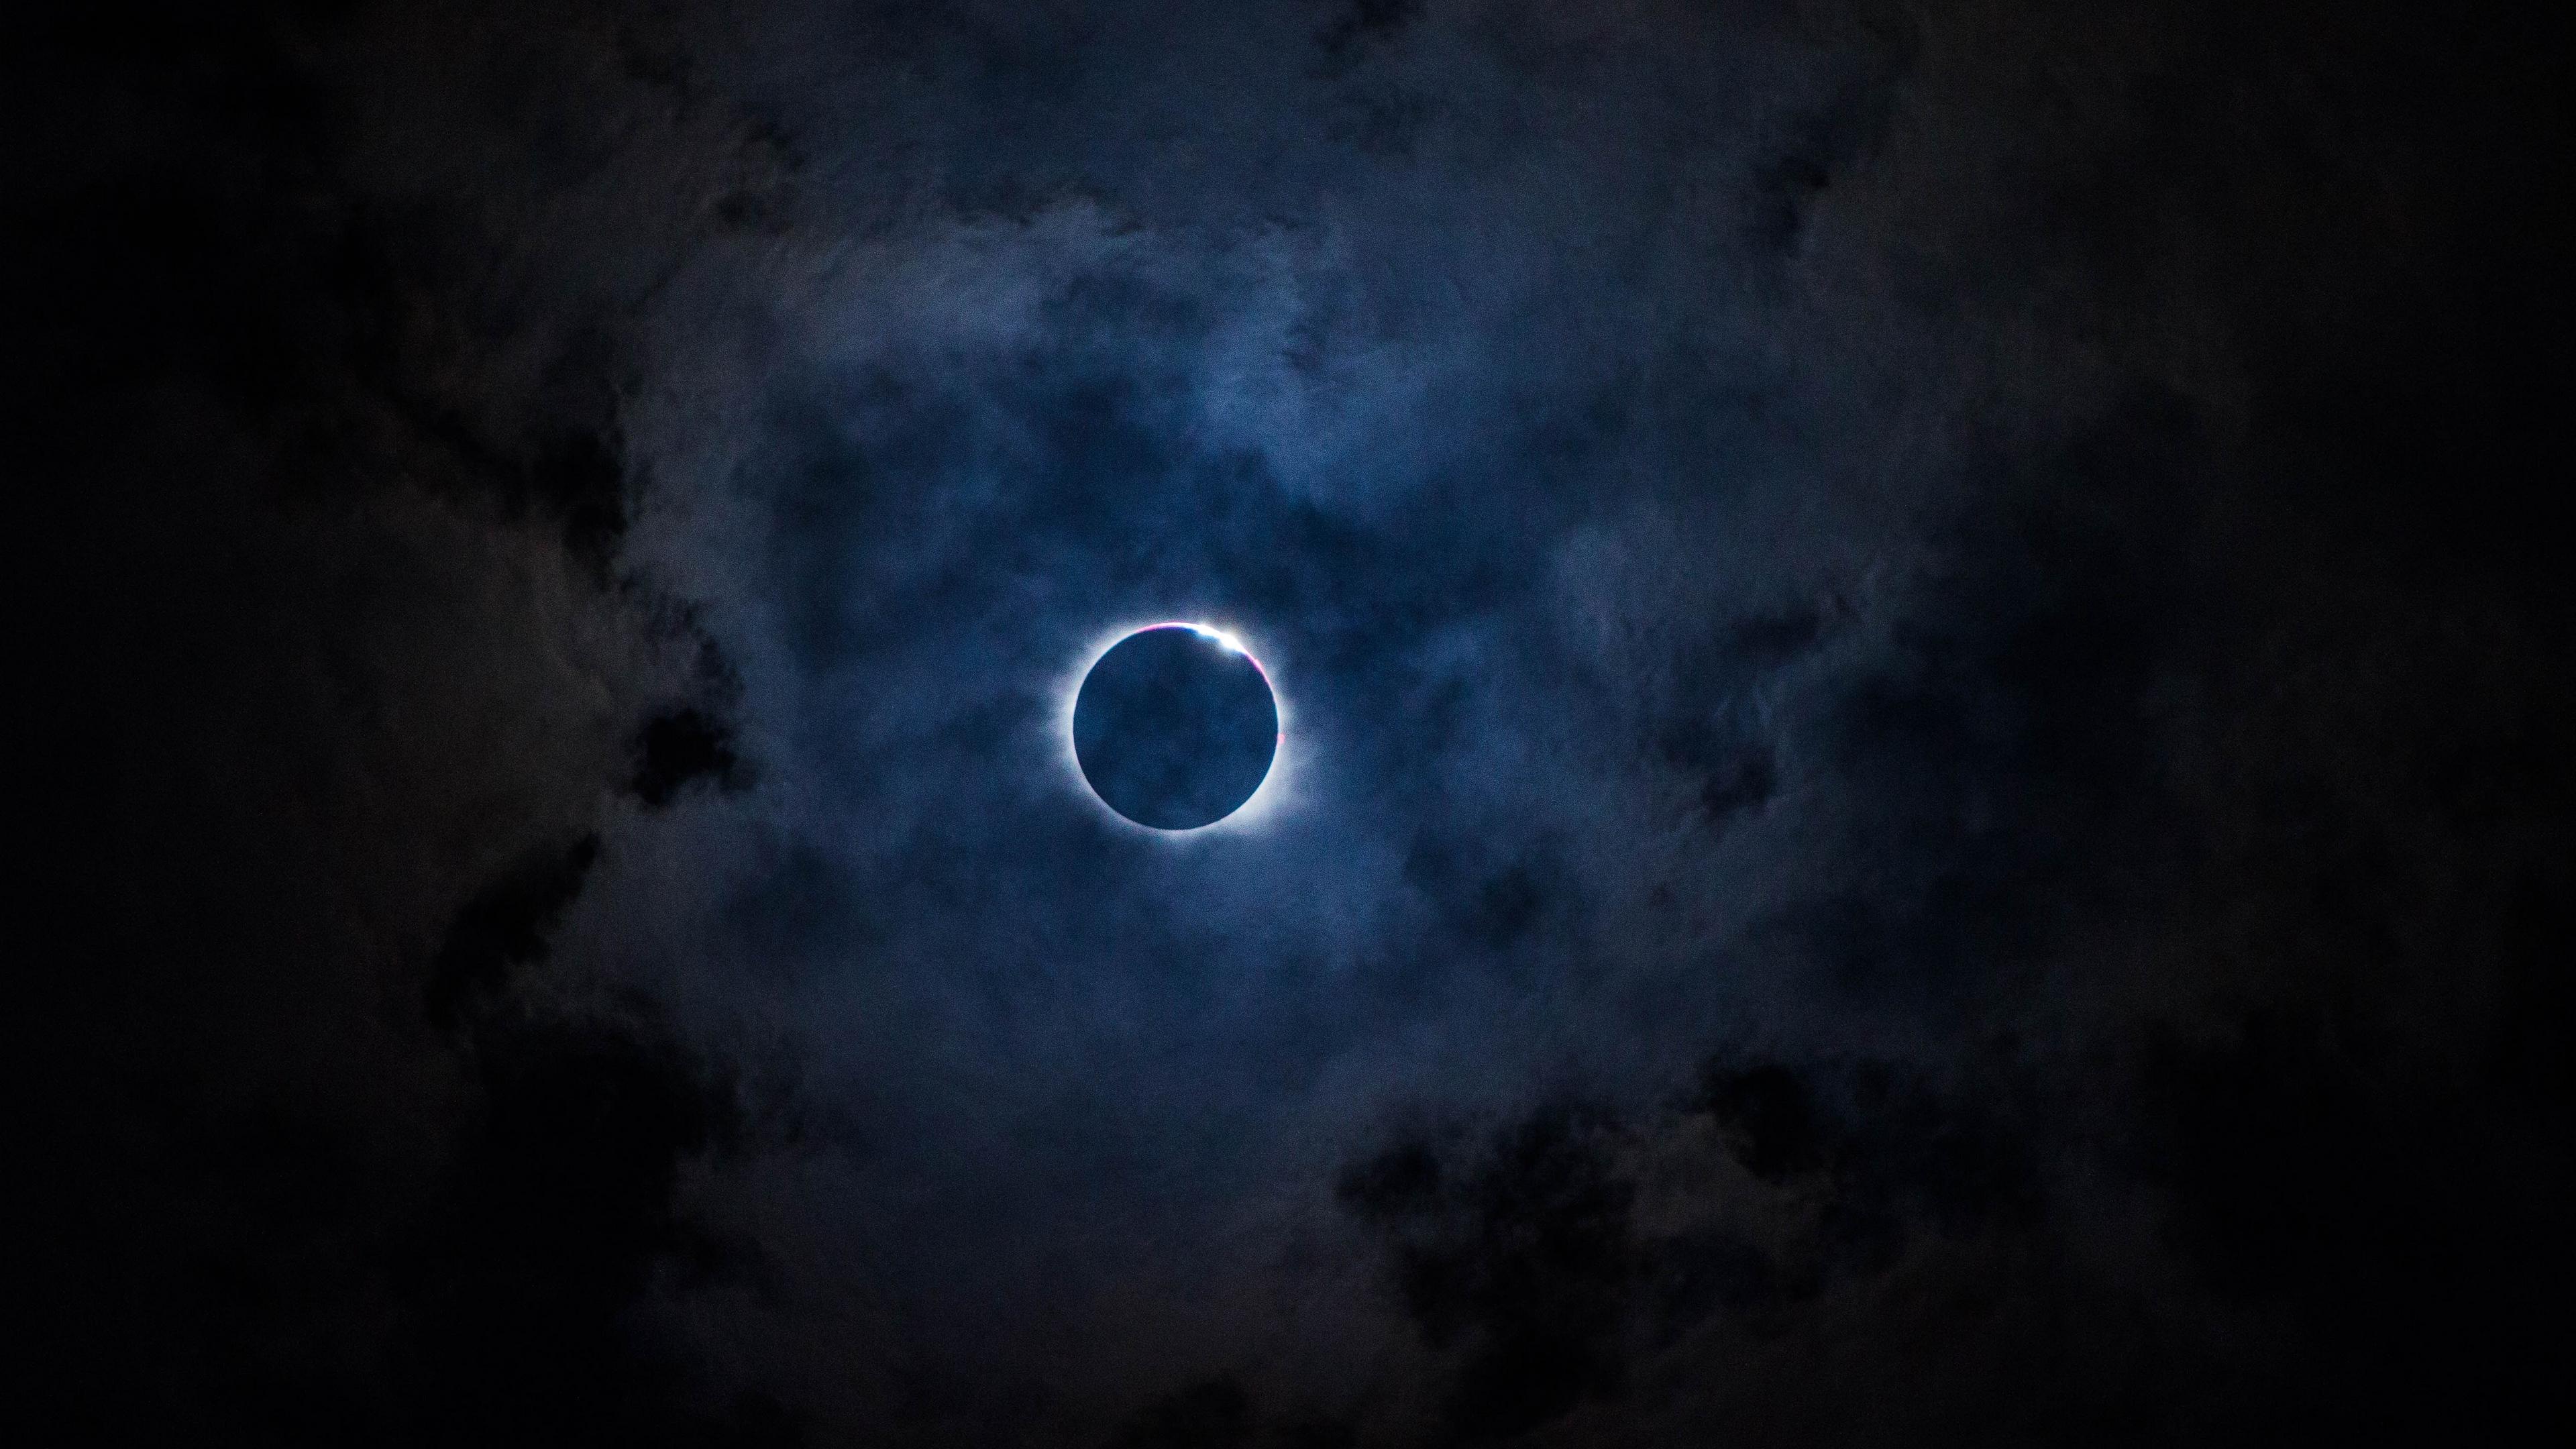 eclipse sky moon clouds 4k 1541114583 - eclipse, sky, moon, clouds 4k - Sky, Moon, Eclipse